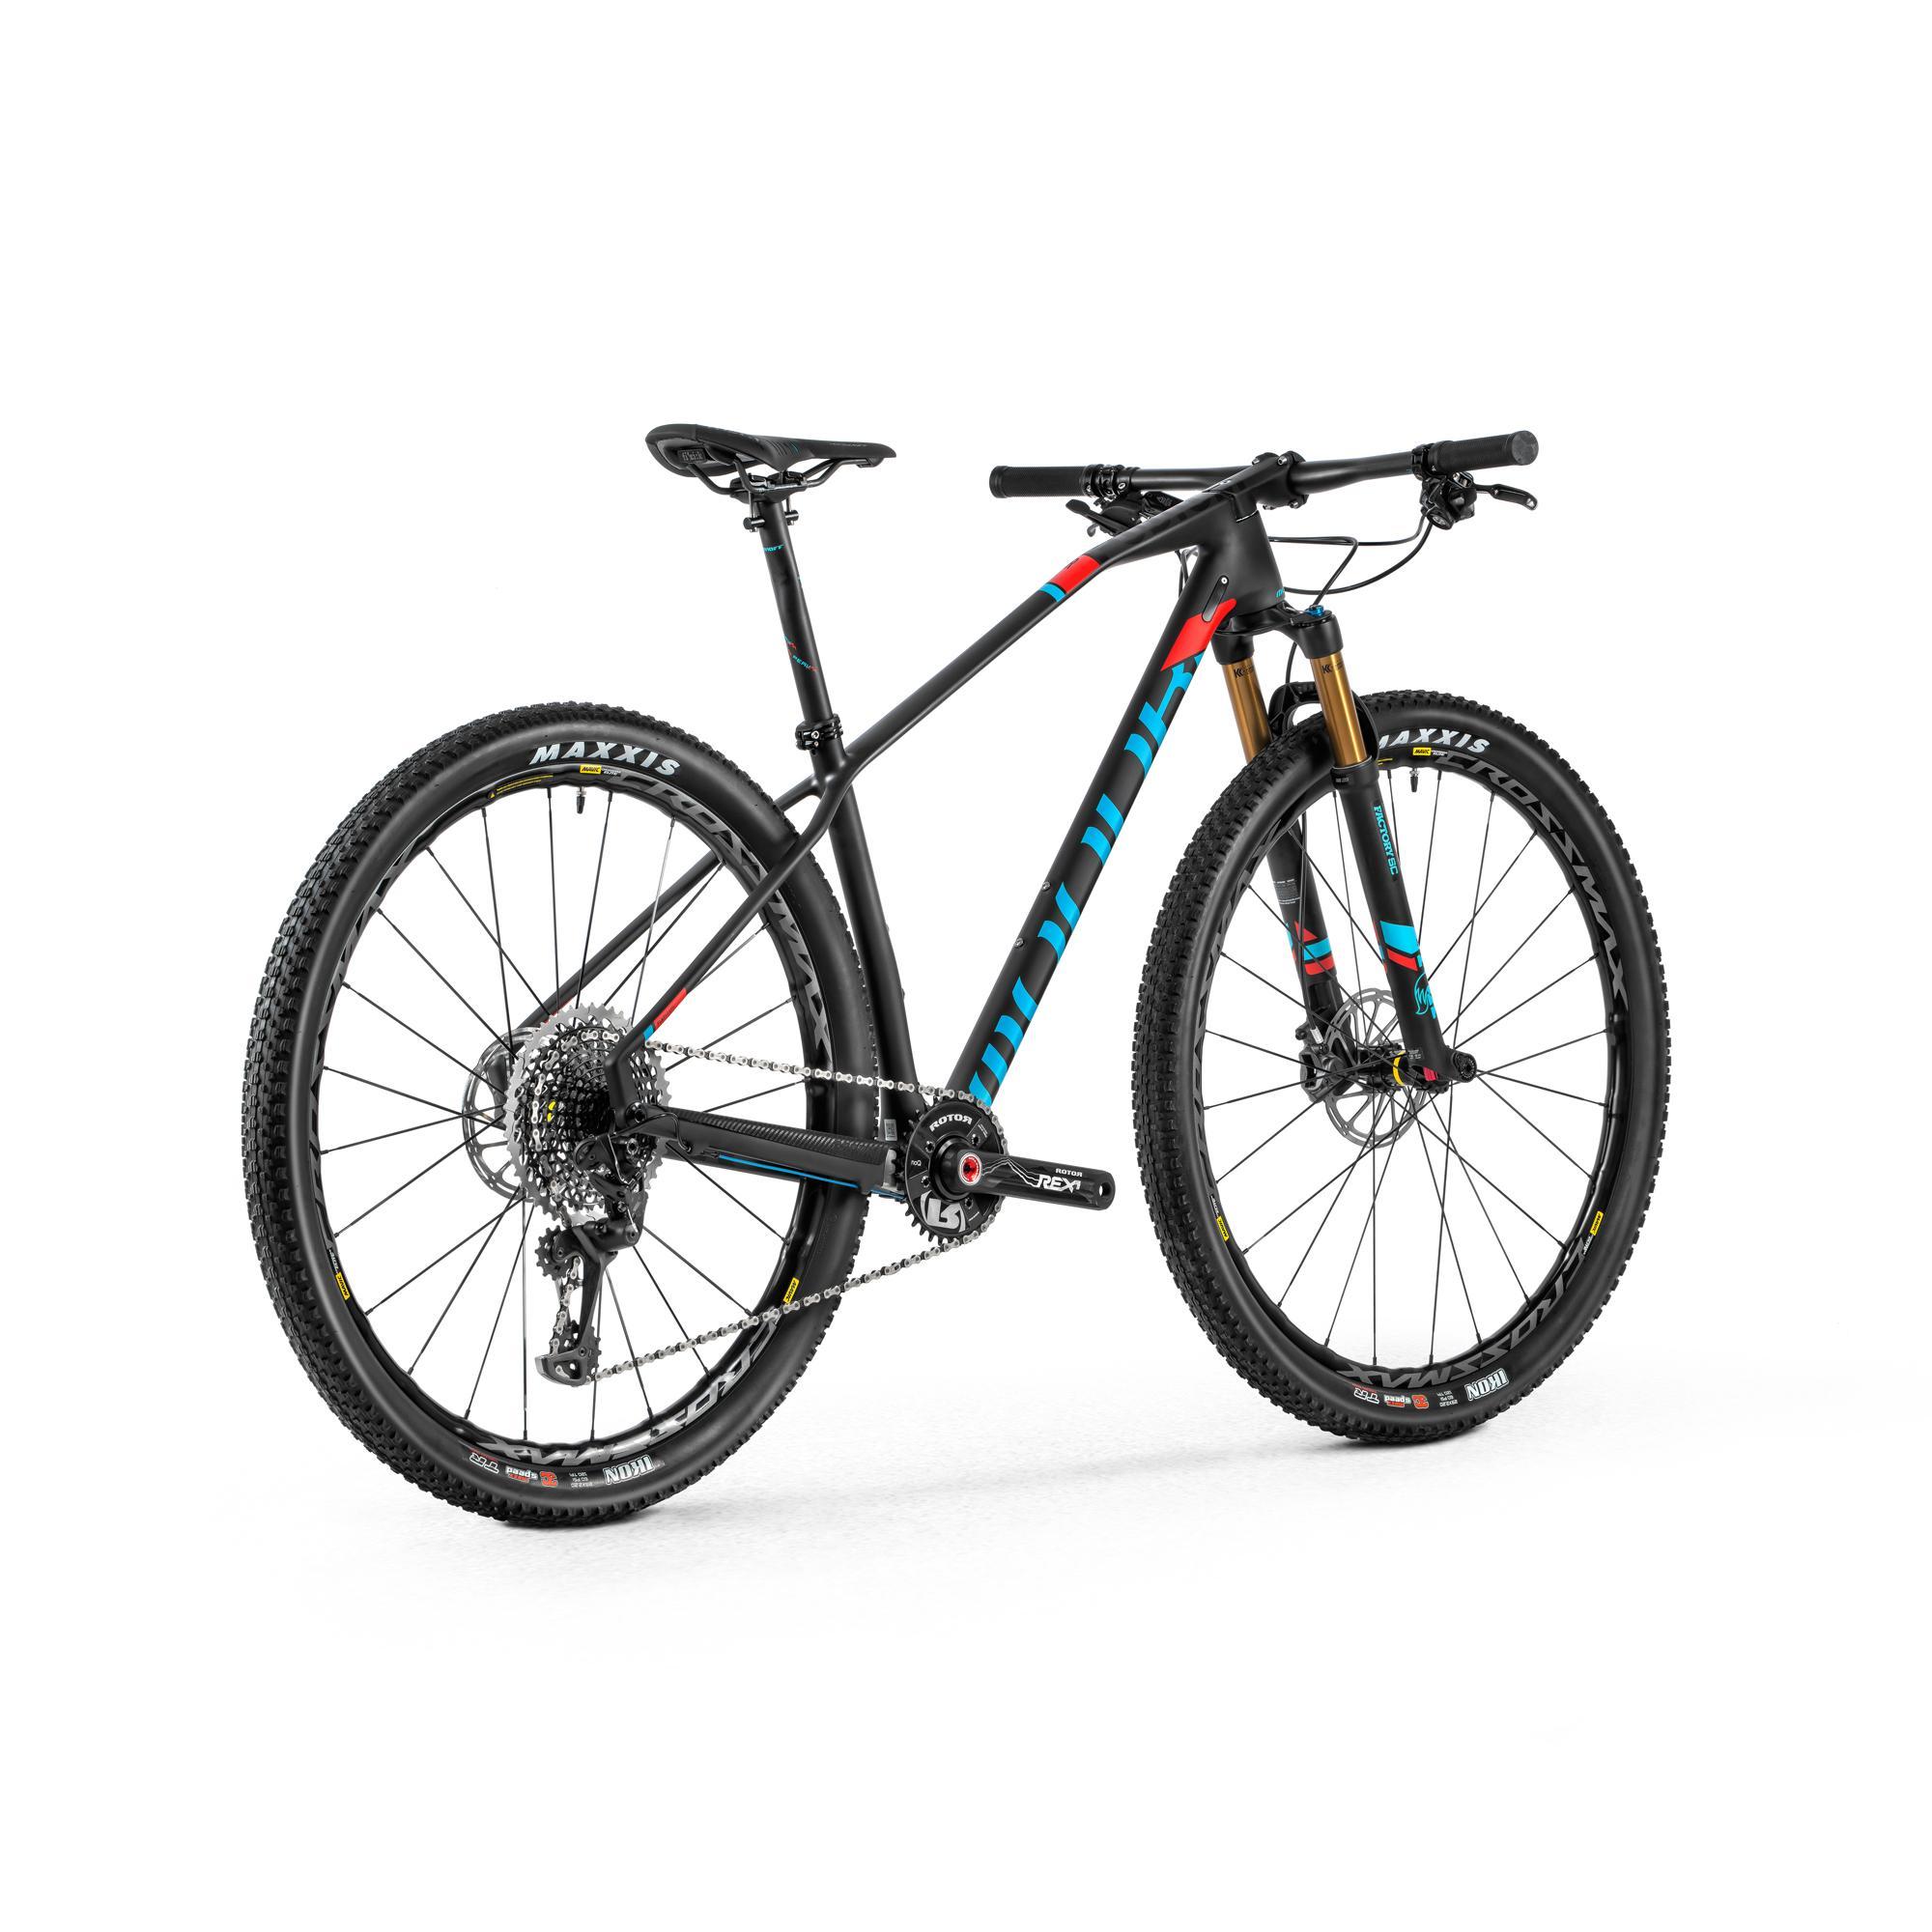 Mondraker Podium Carbon Rr 29er Bike